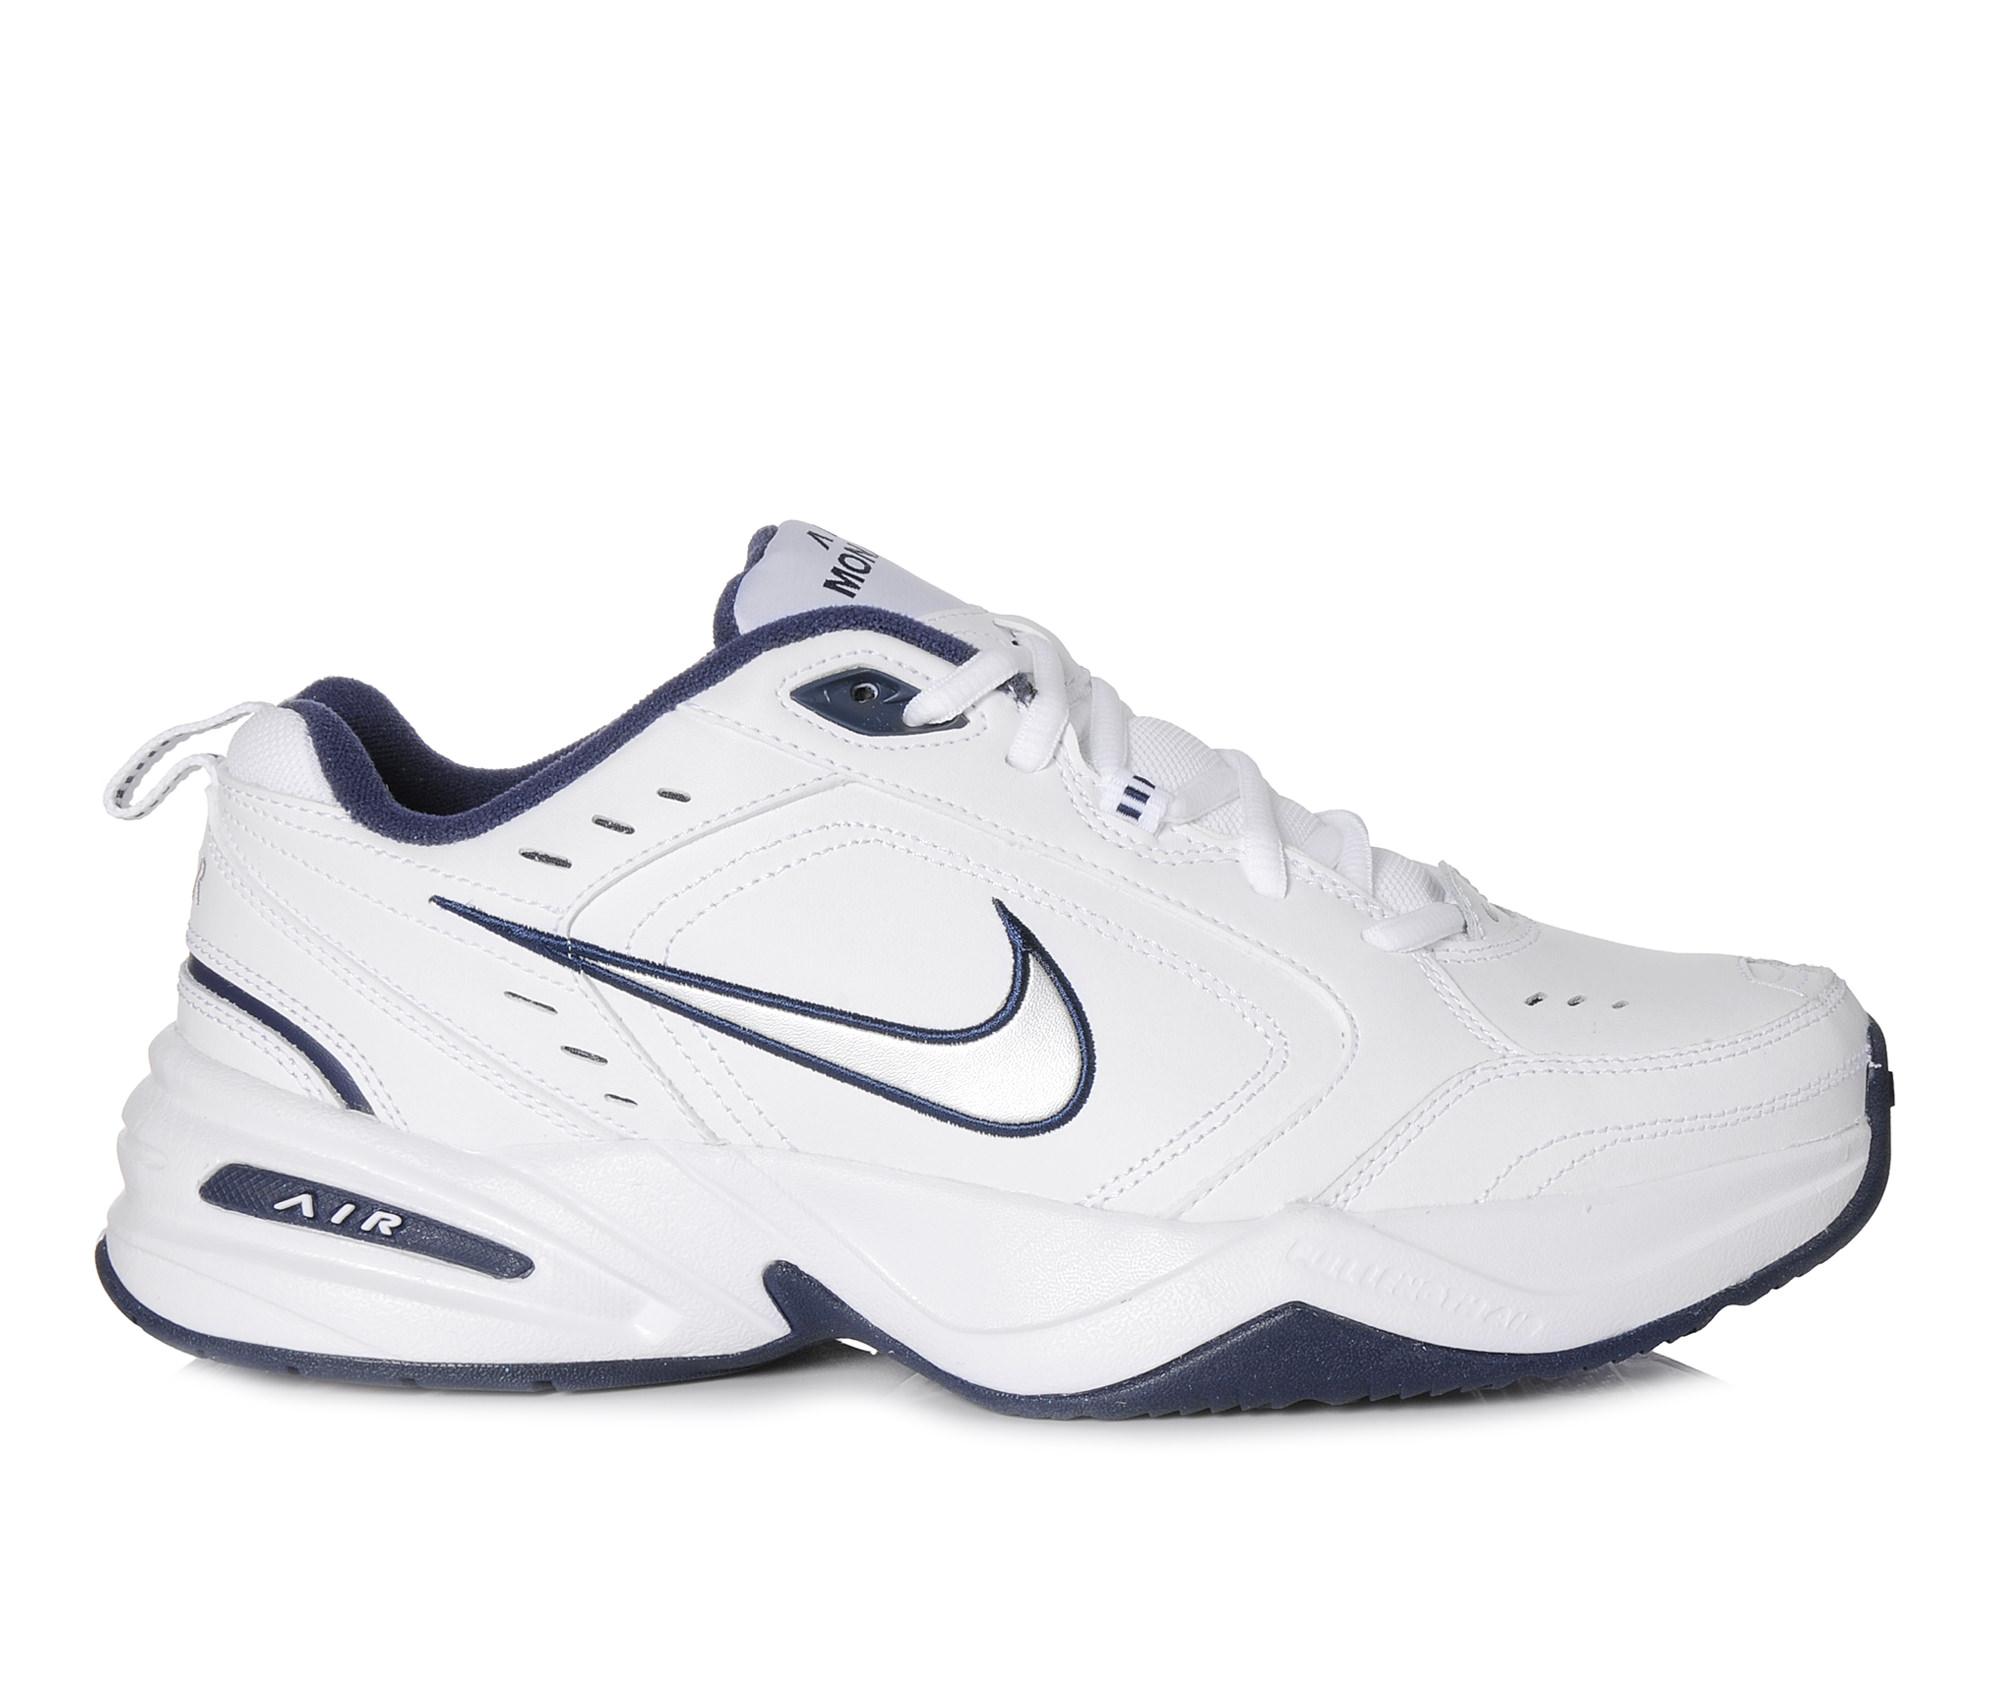 Men's Nike Air Monarch IV Training Shoe (White - Size 9.5) 1143325